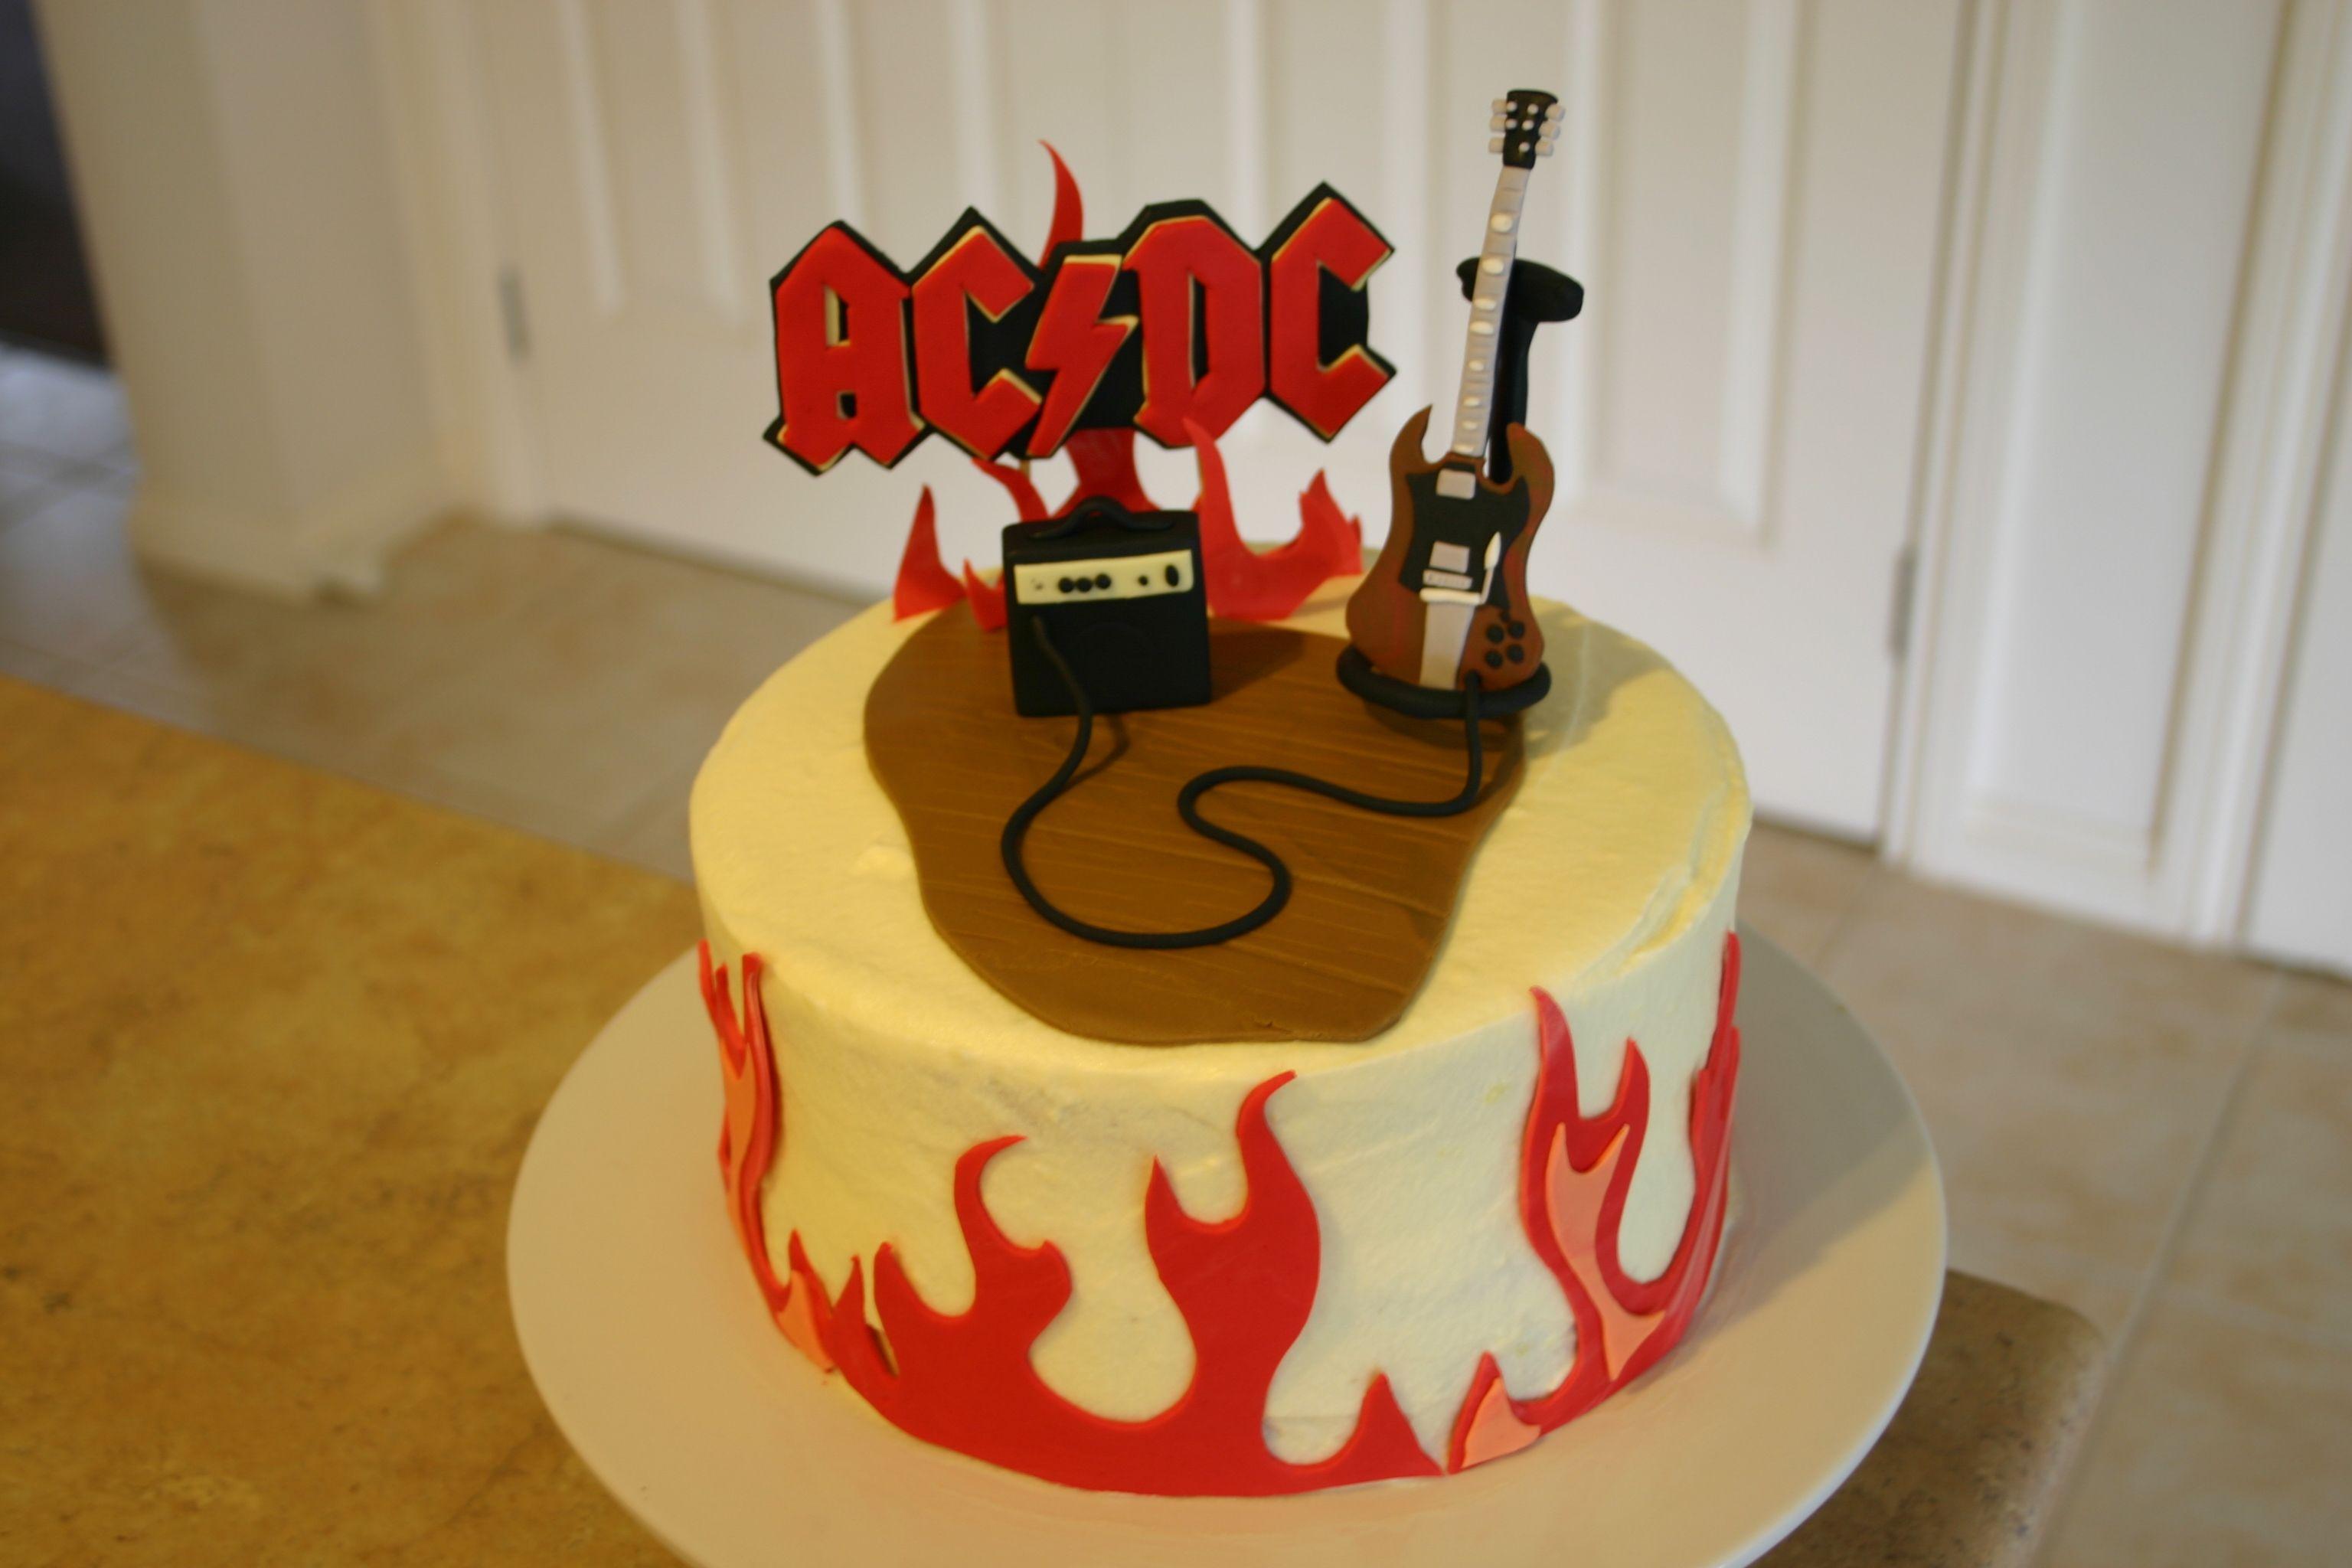 ac dc birthday cakes